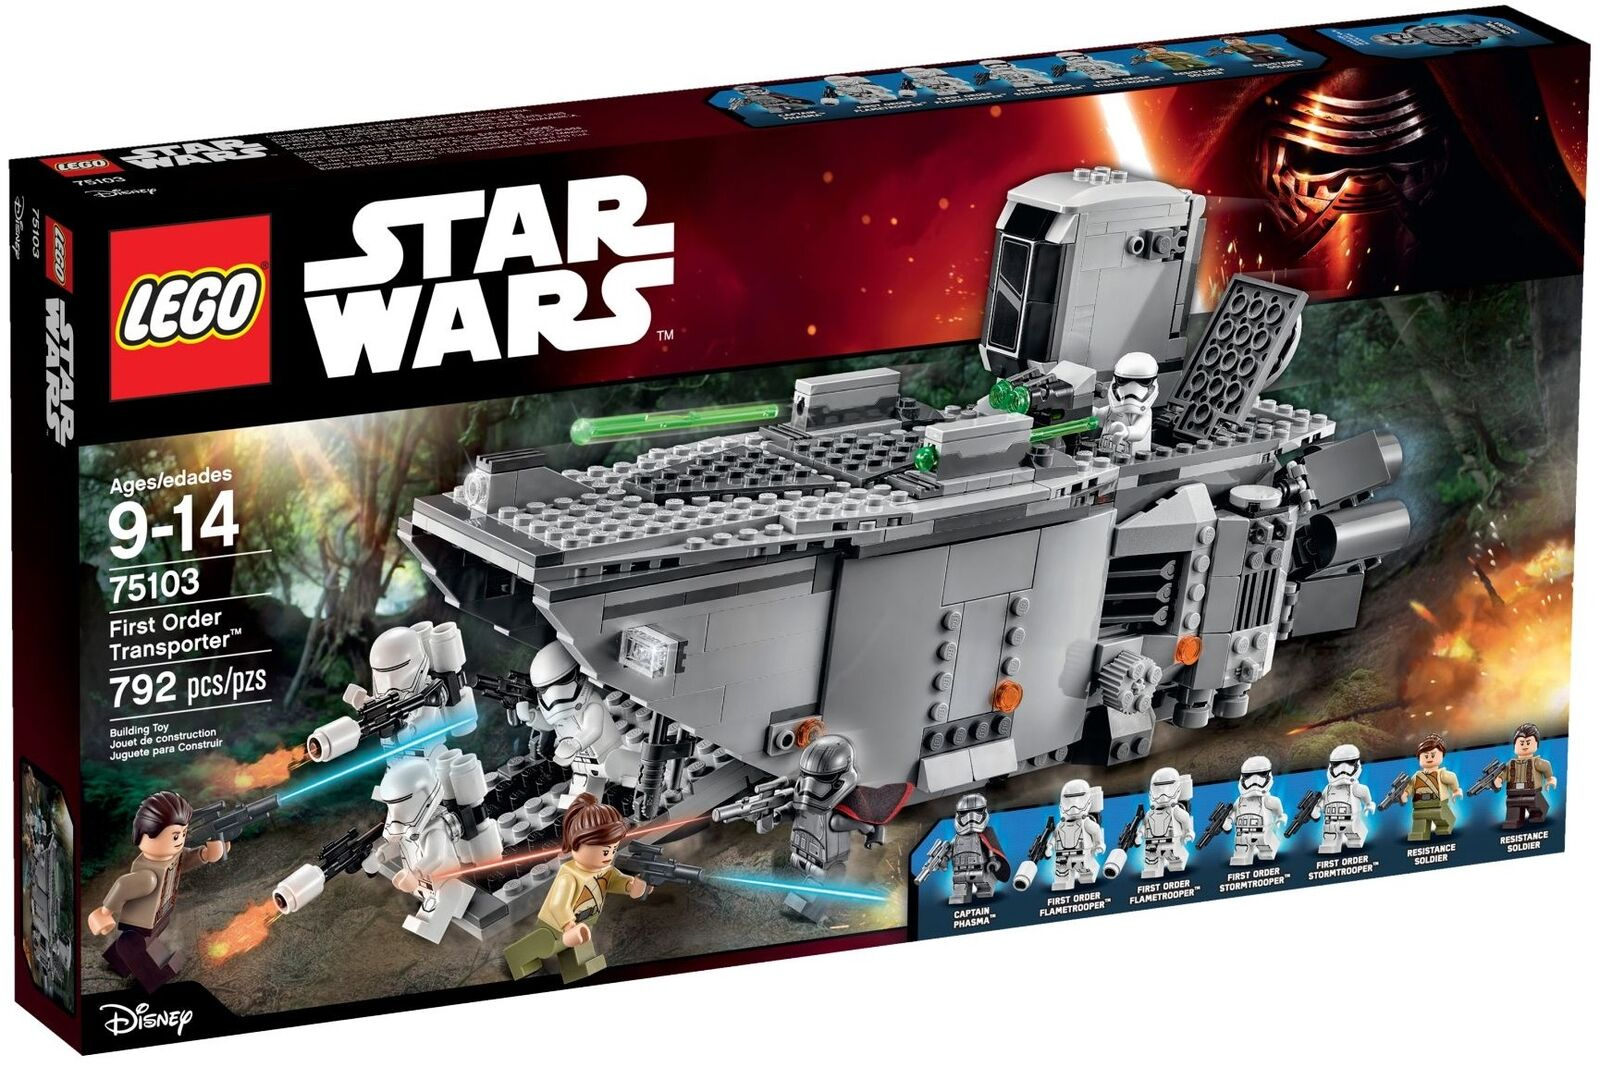 LEGO 75103 Estrella Guerras primero Order Transporter nuovo with DAMAGED scatola